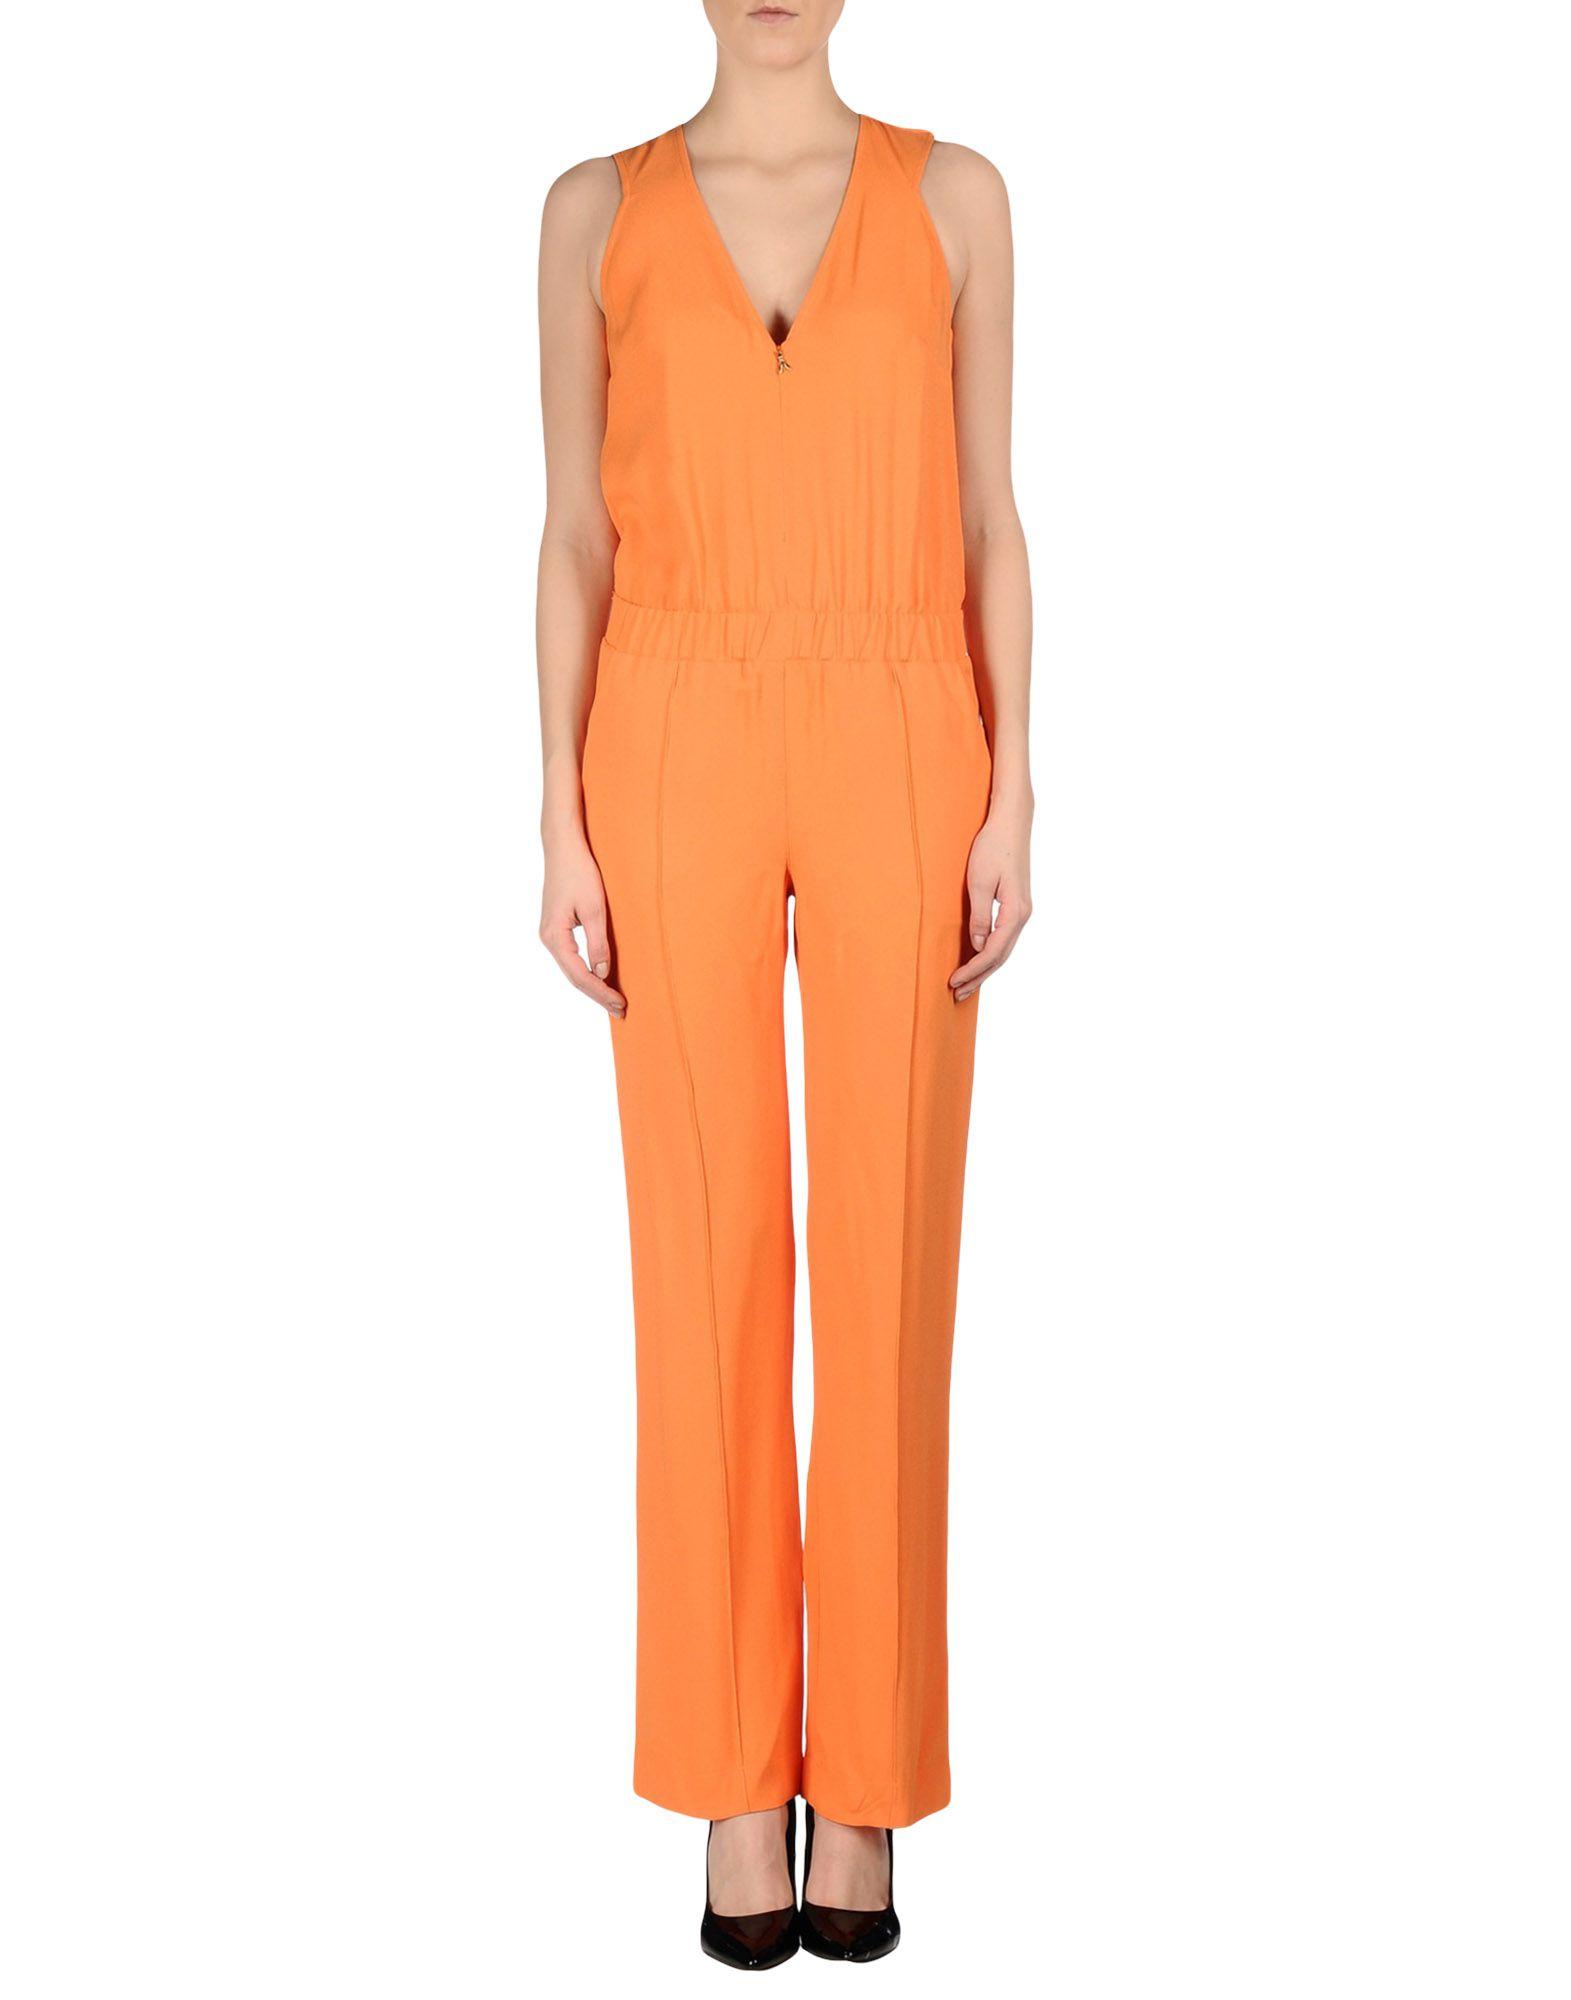 Popular OrangeJumpsuitCostumeforWomen Orange Jumpsuit Costume For Women